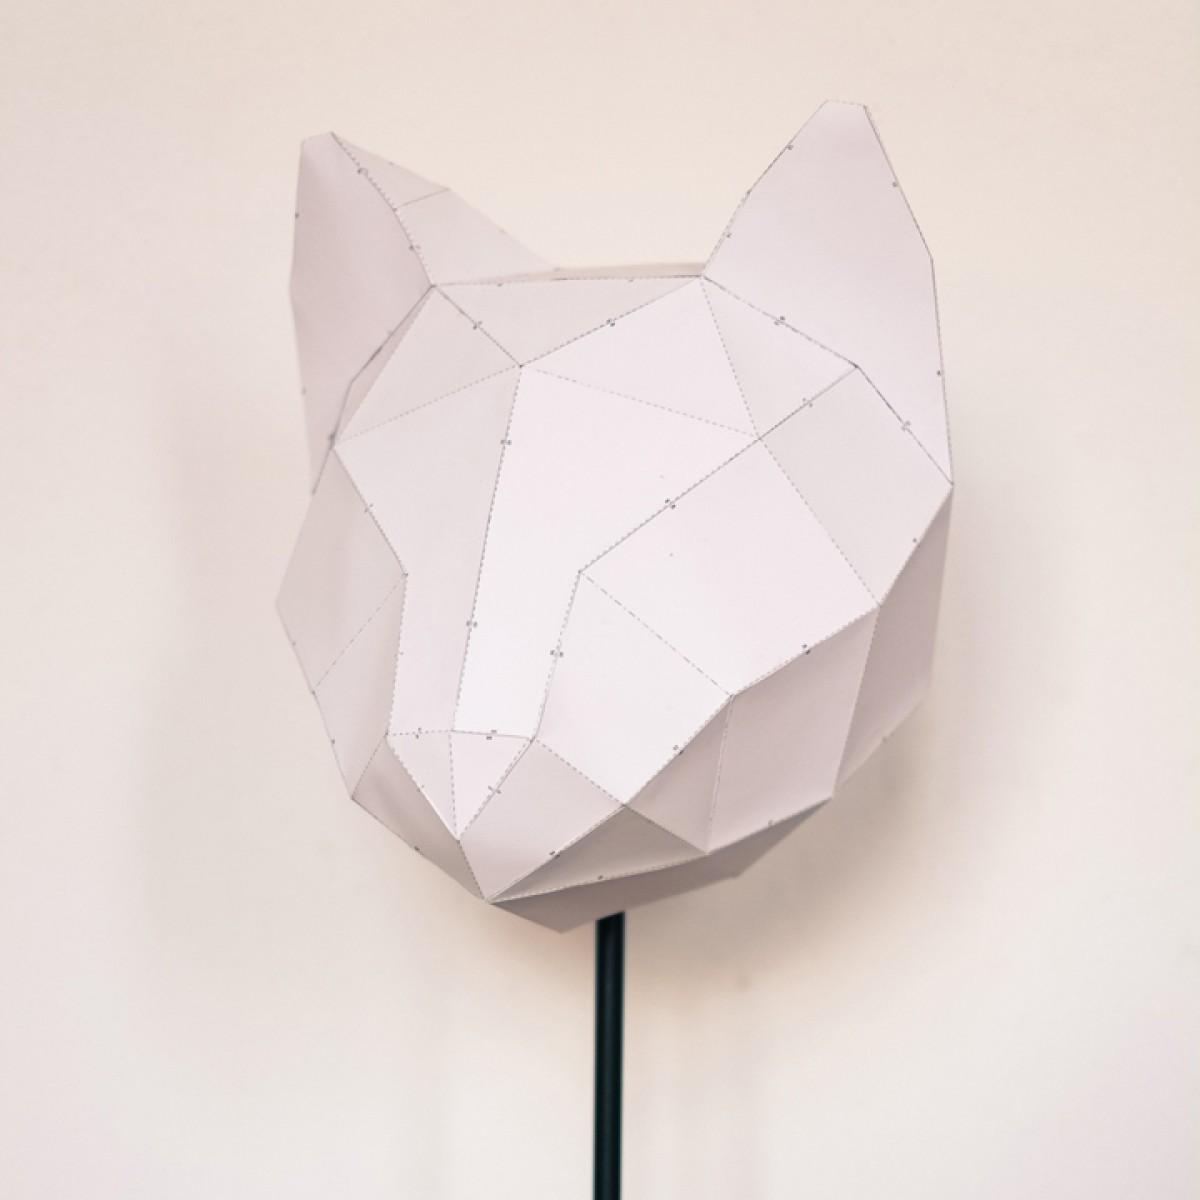 Cat Medium - Do It Yourself Papierlampenschirm